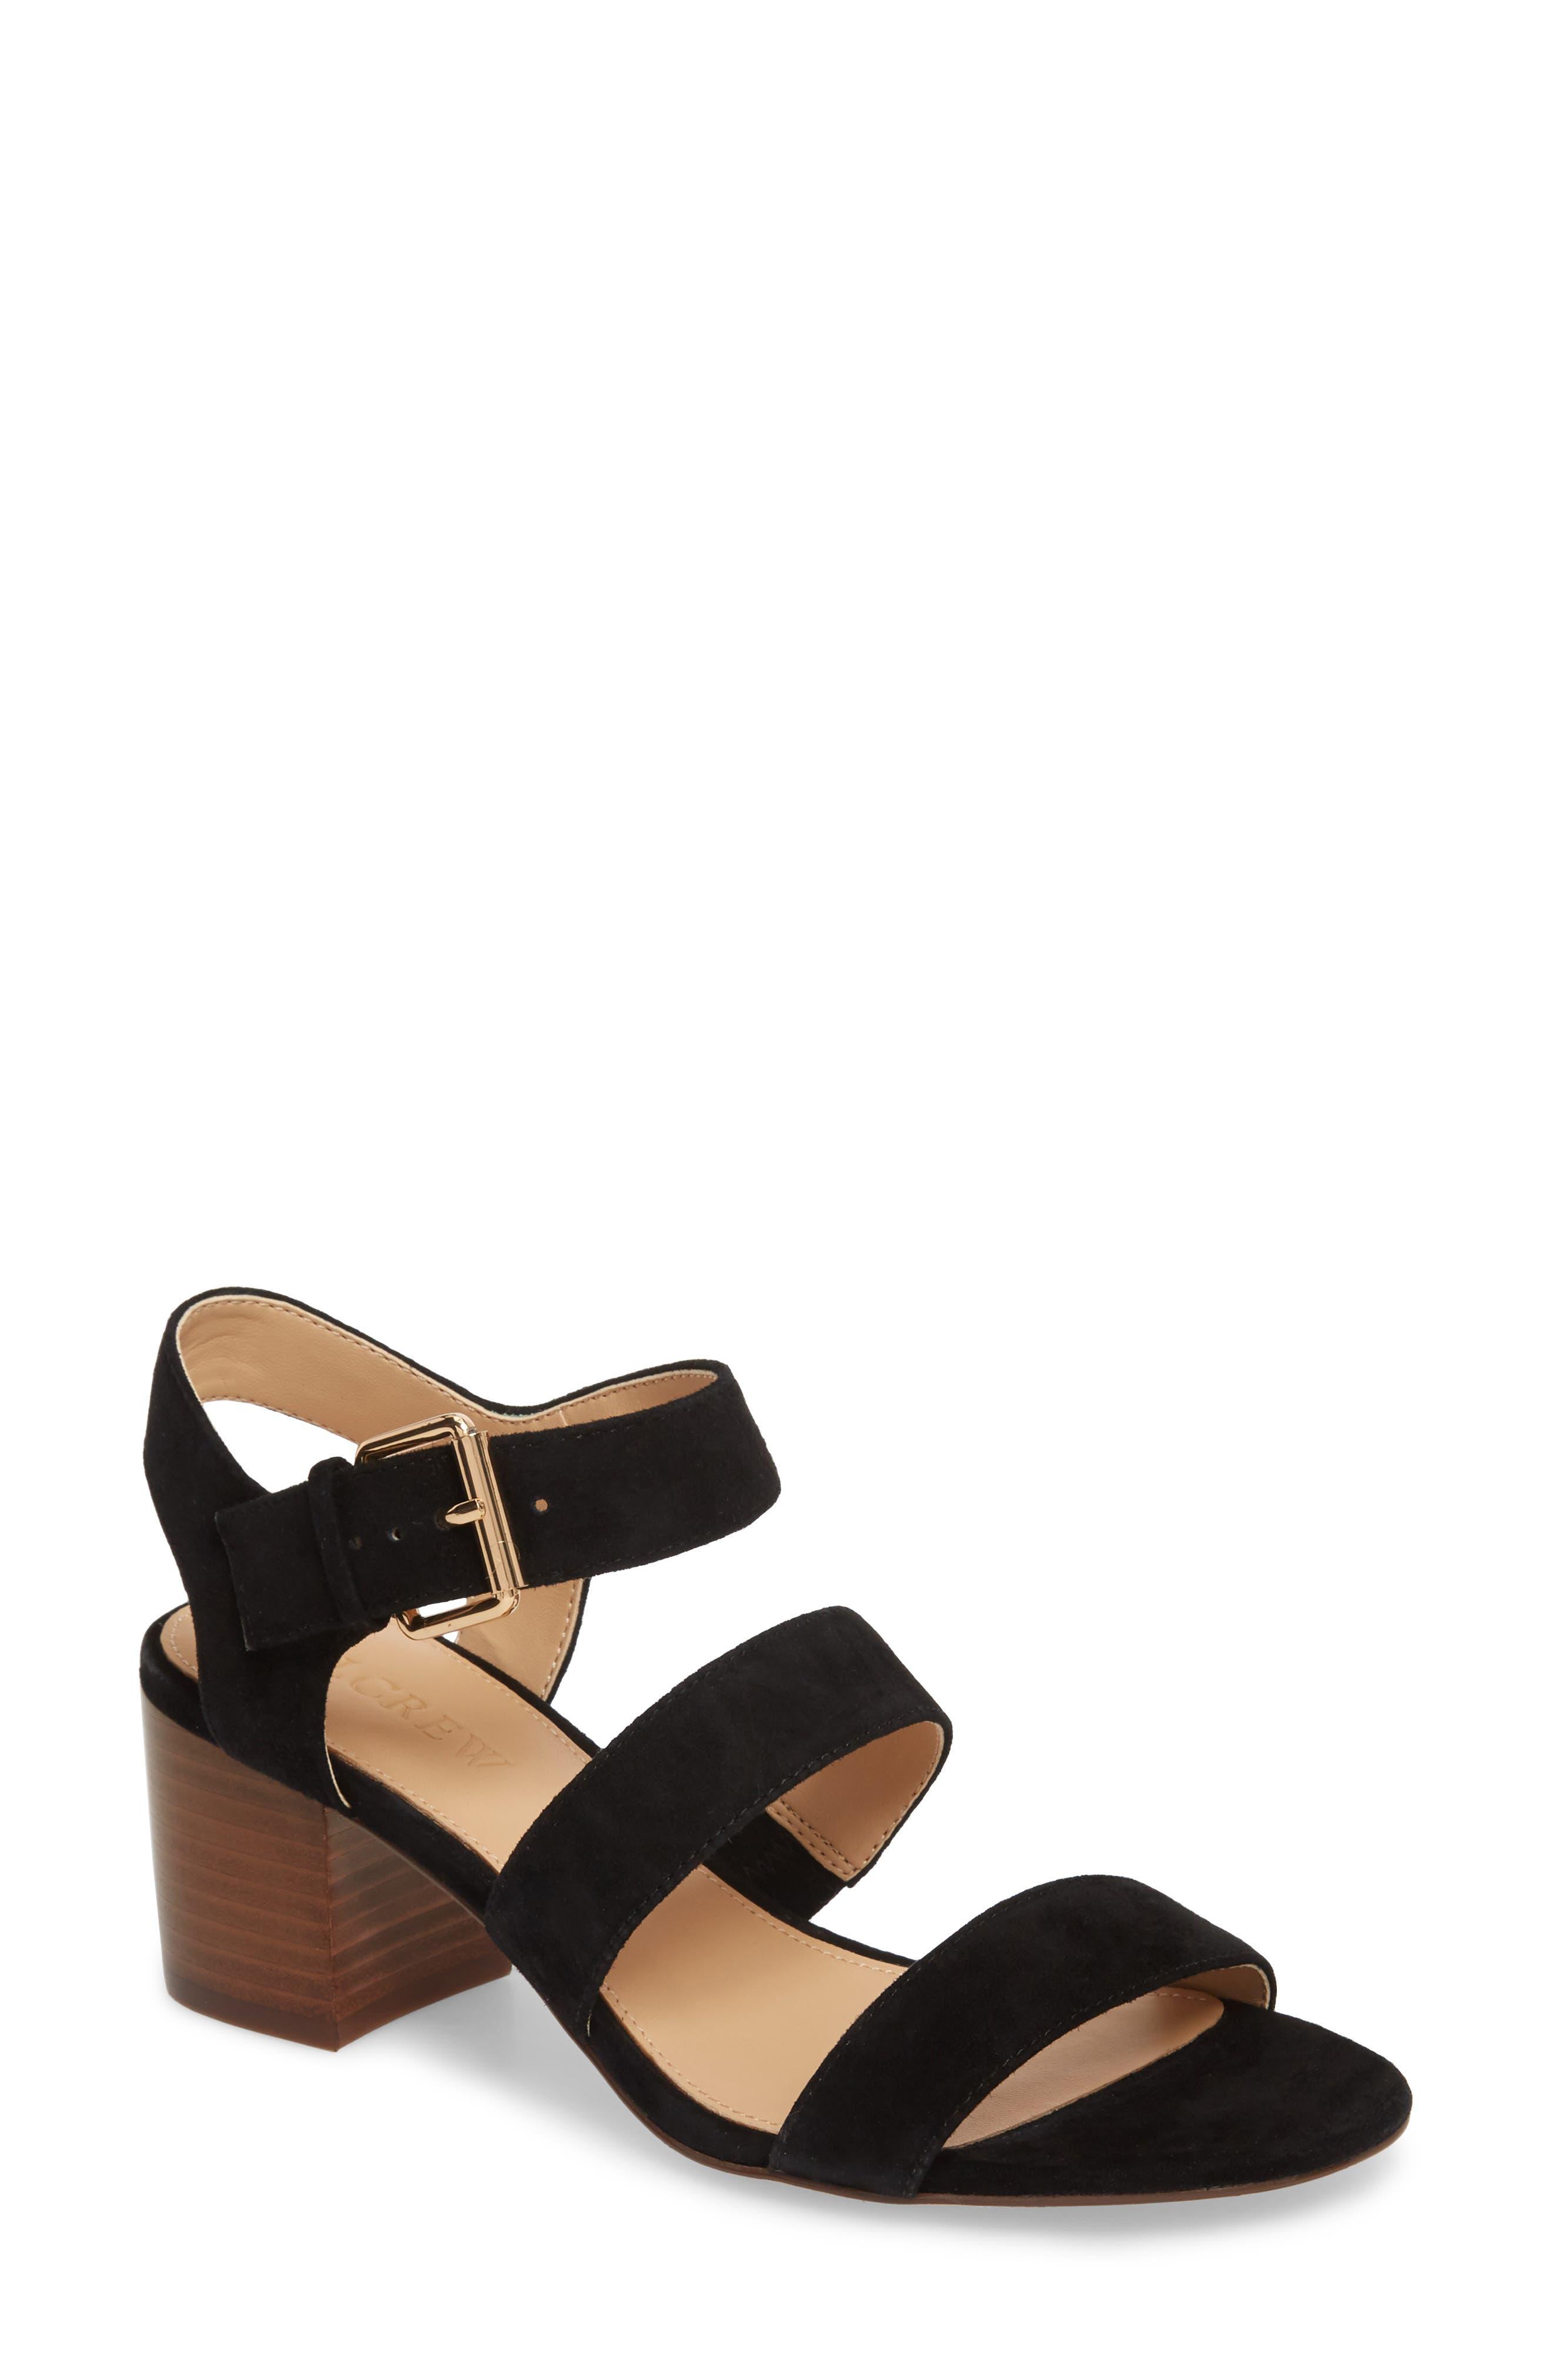 Three-Strap Suede Sandal,                             Main thumbnail 1, color,                             Black Suede